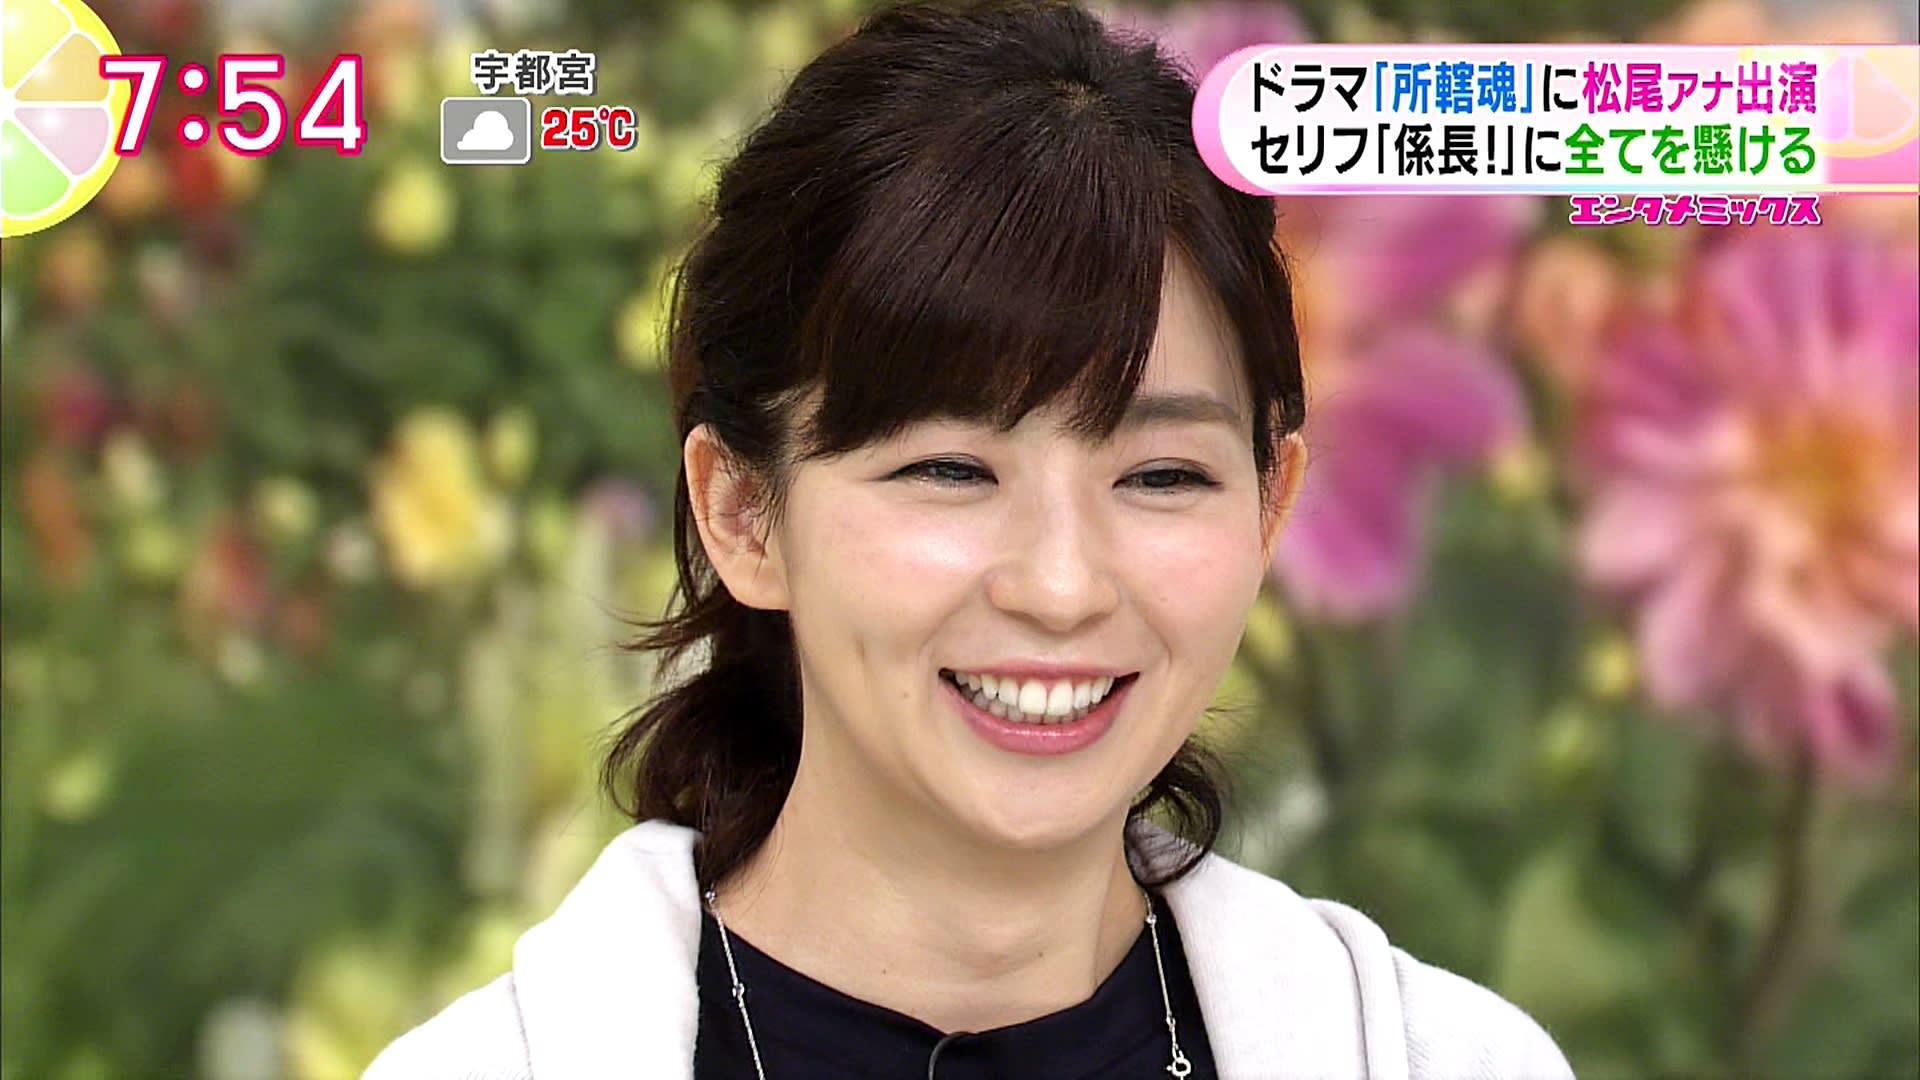 7時54分の松尾由美子